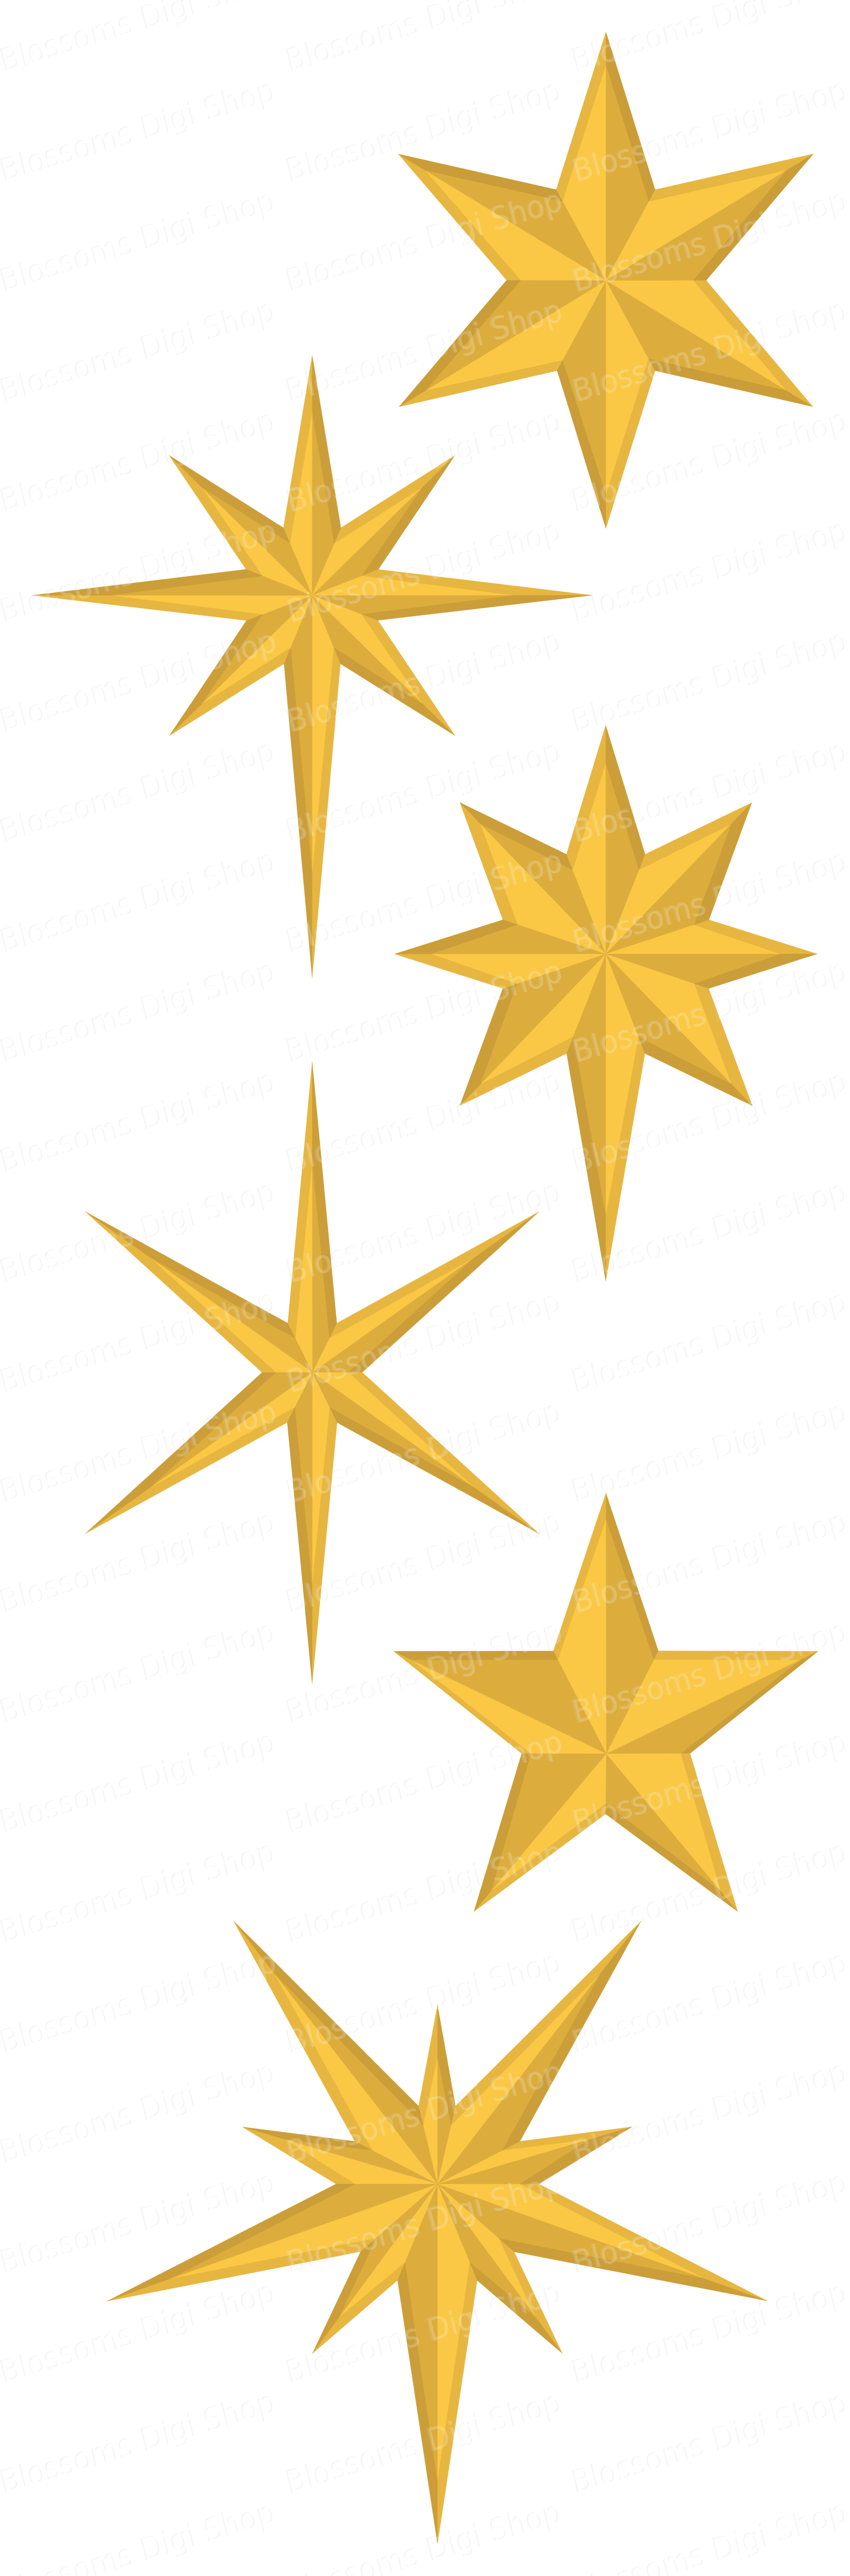 Clipart star christmas jpg library stock Christmas stars clipart, gold star clipart, star elements, star ... jpg library stock